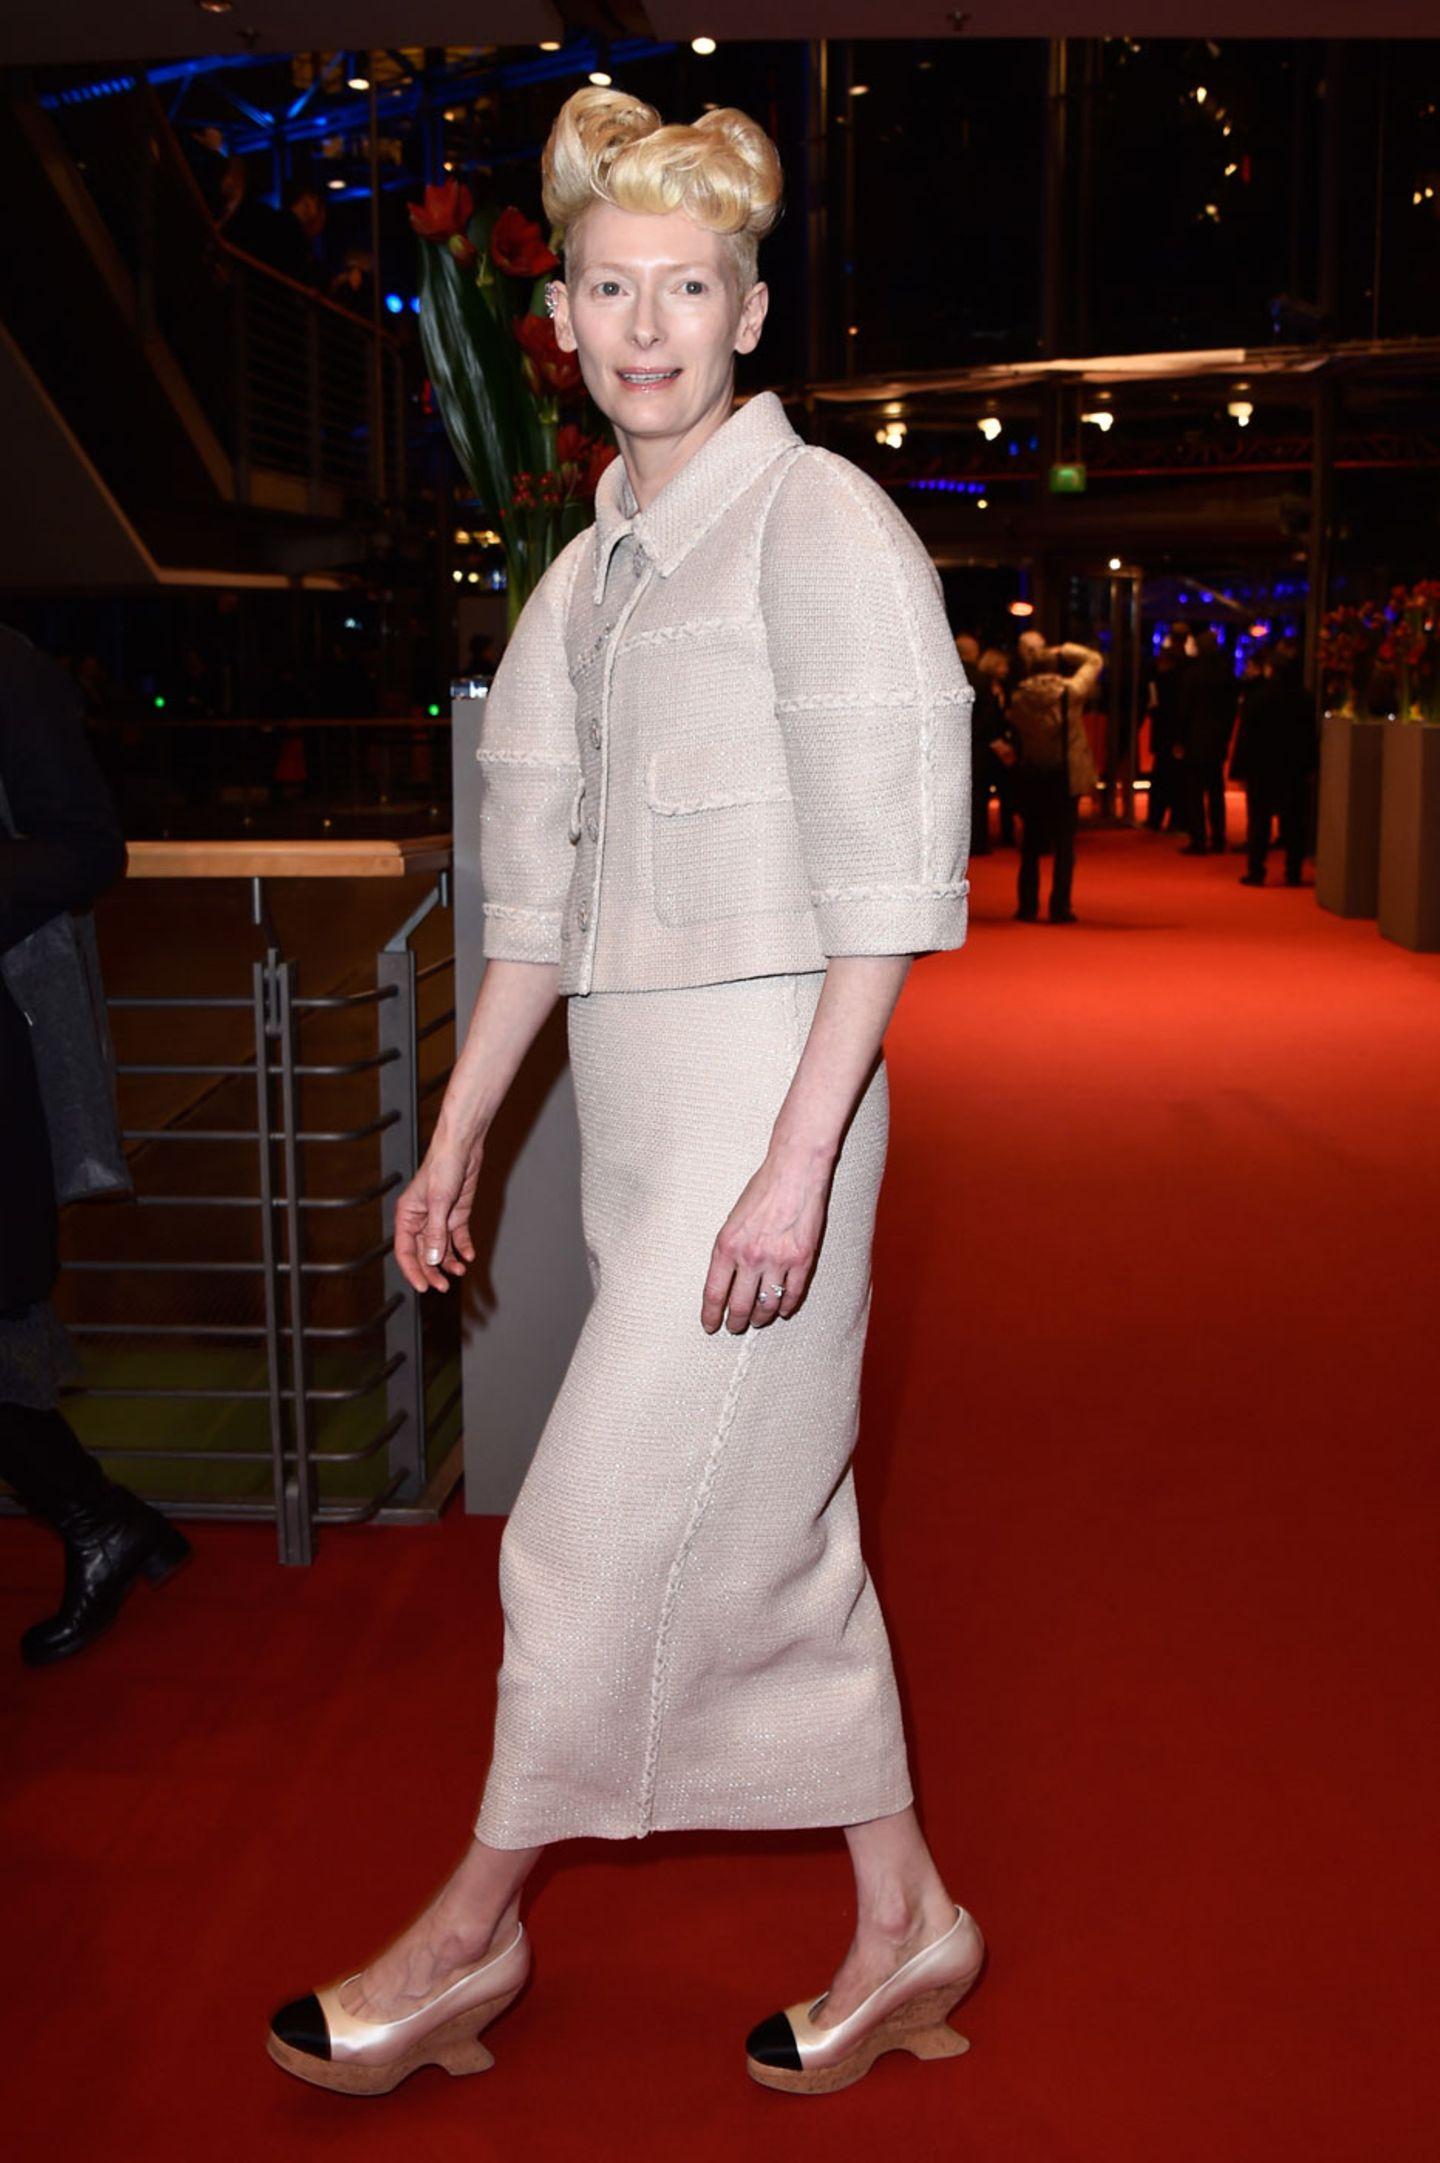 Berlinale 2016: Tilda Swinton